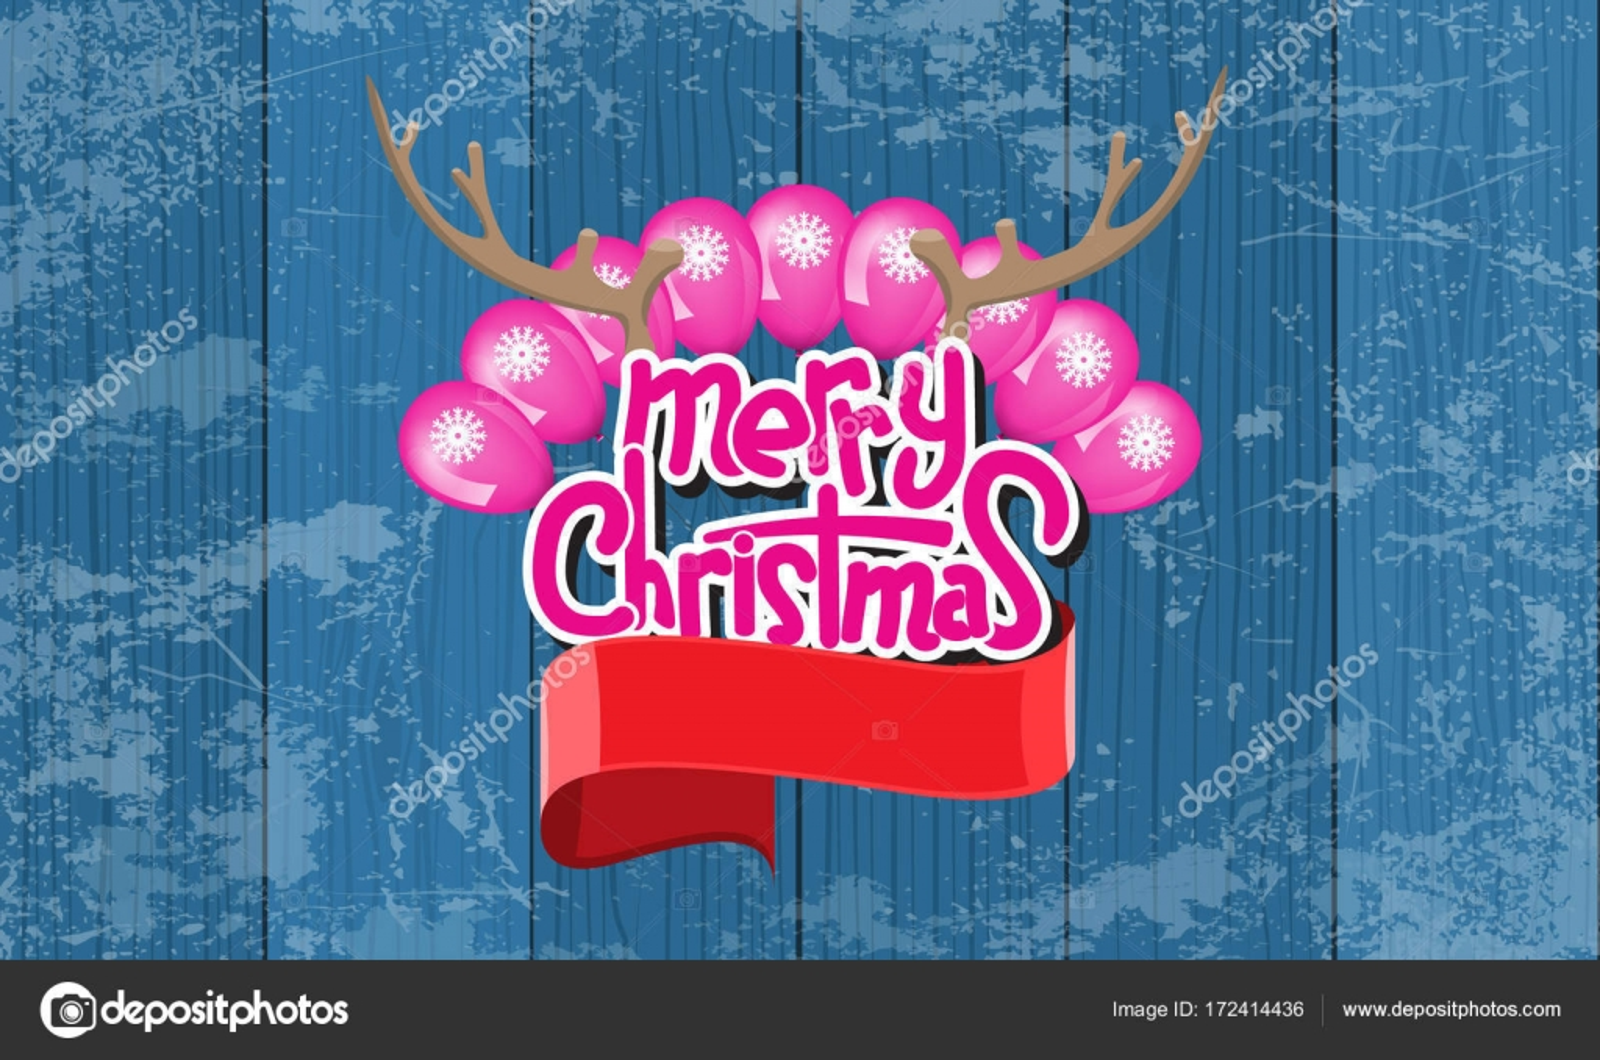 Frohe weihnachten schriftzug aus holz